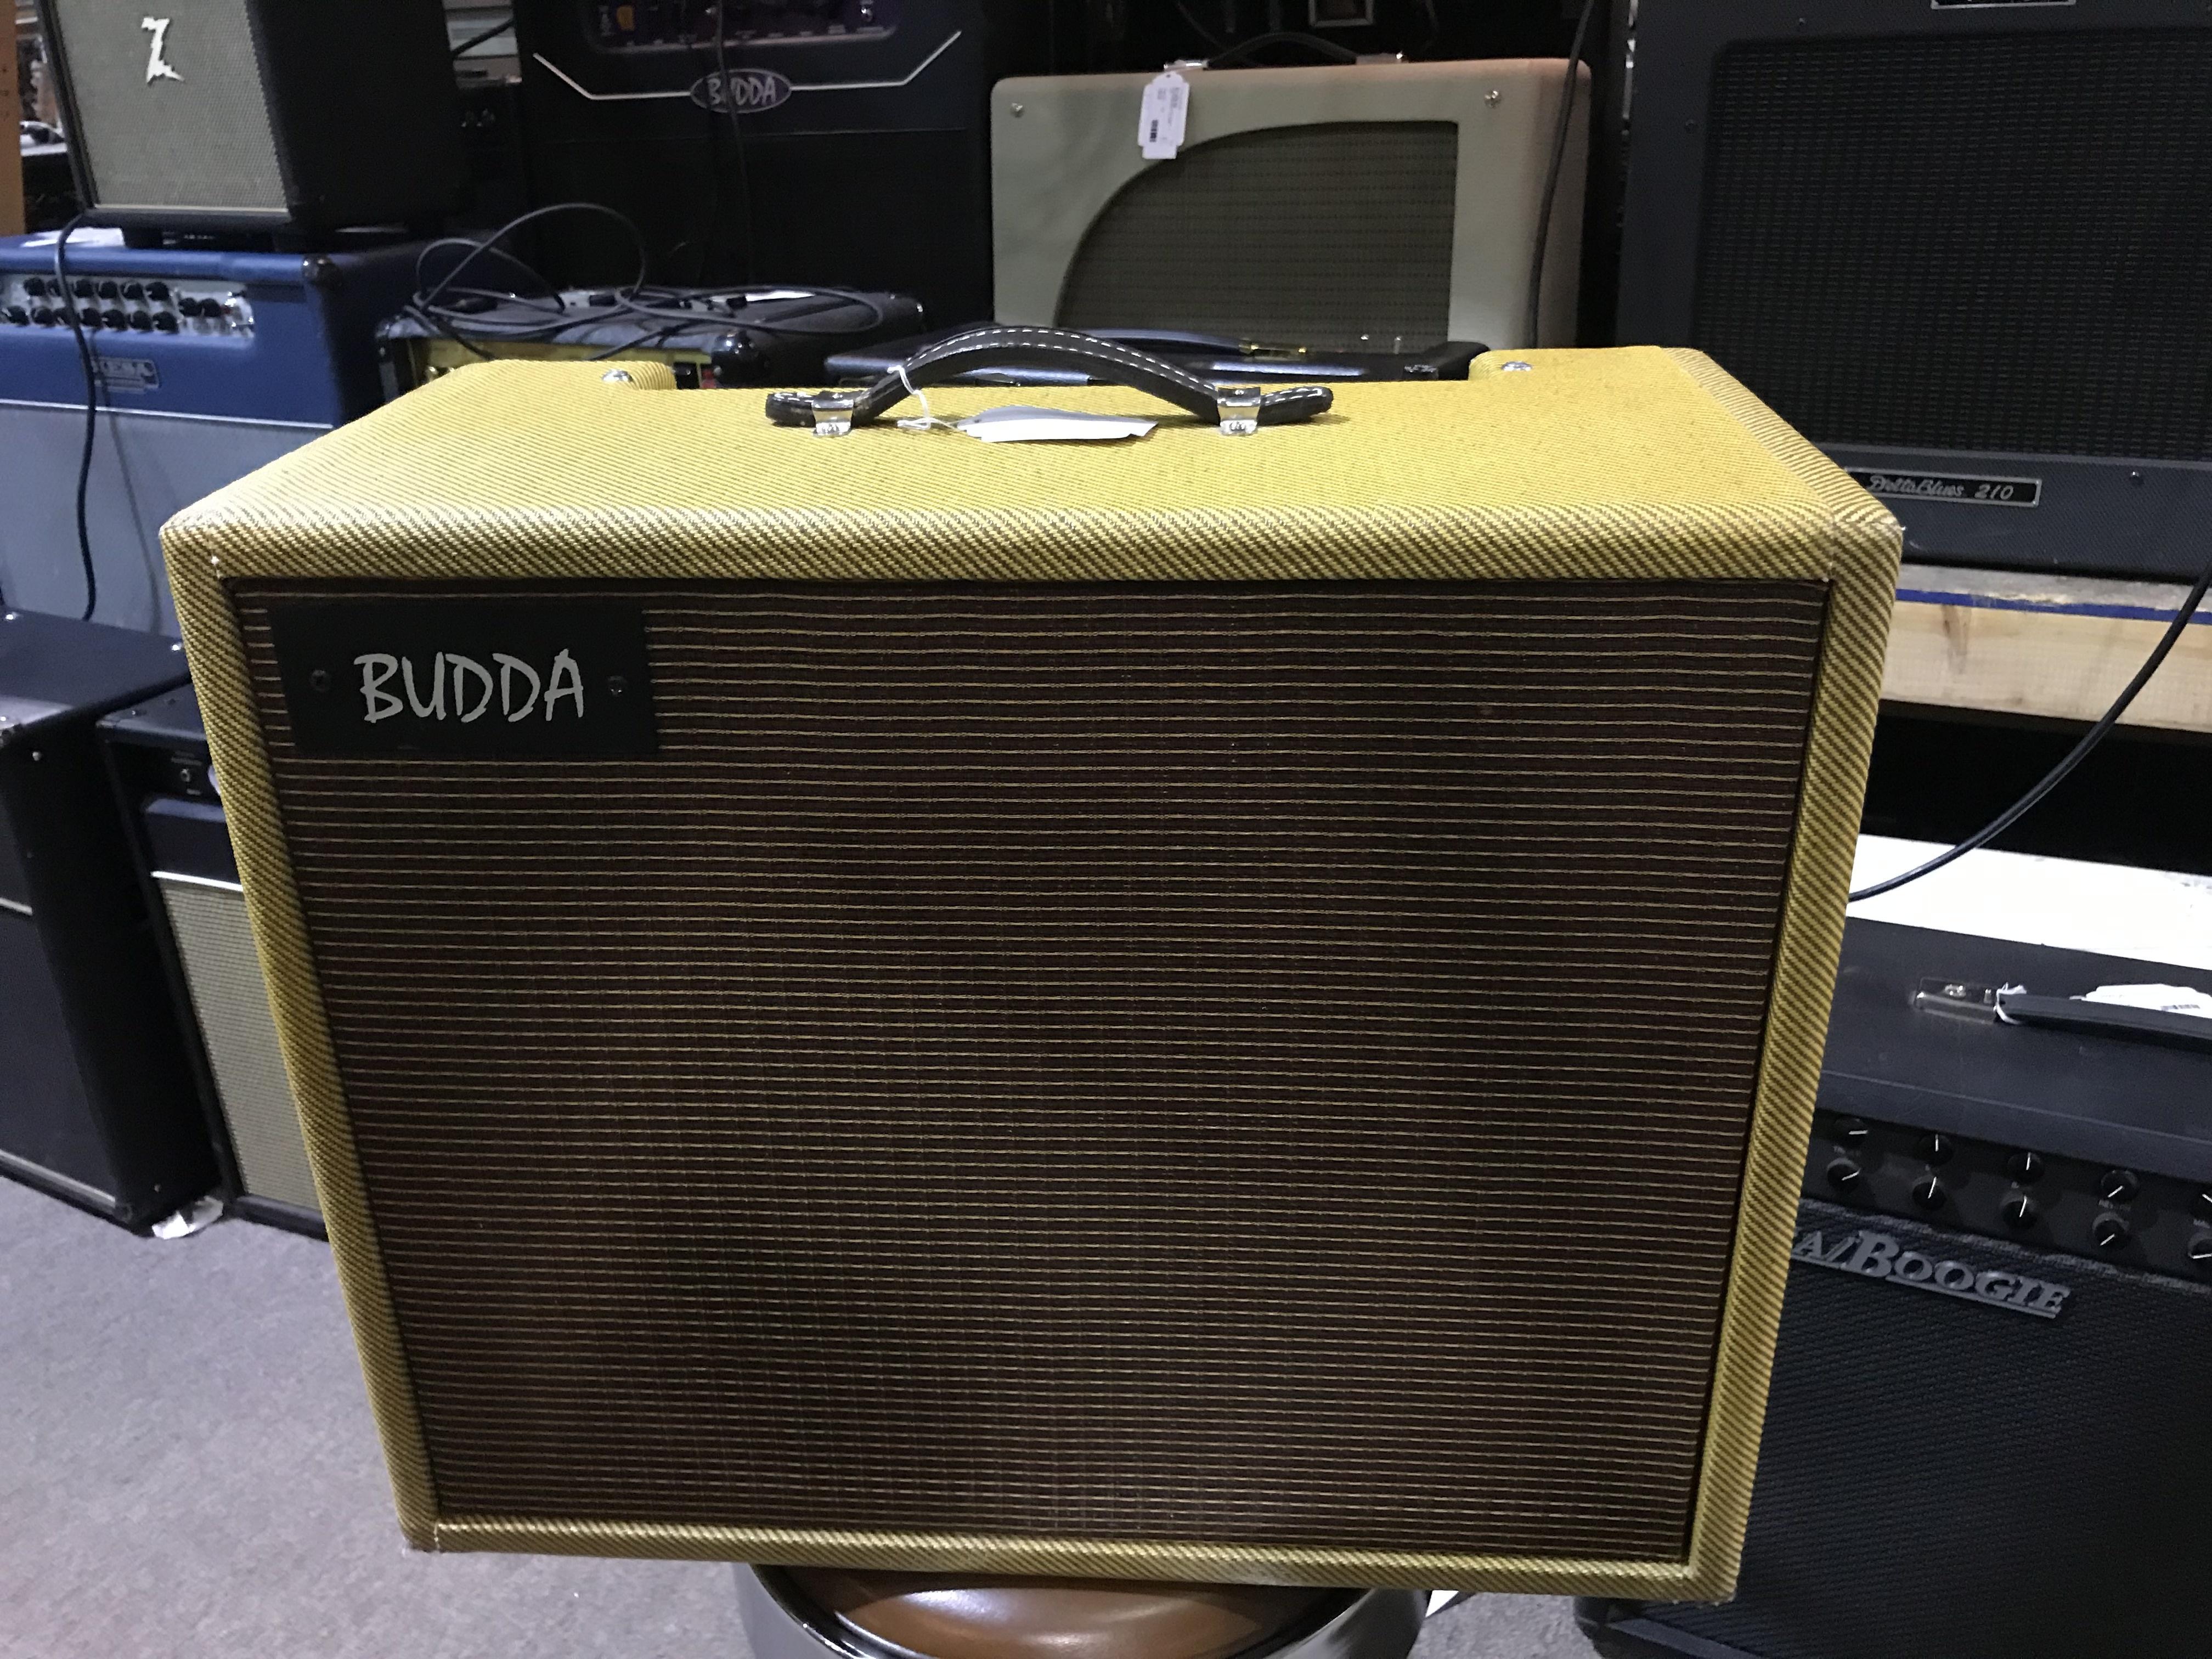 BUDDA TWINMASTER 10 Tweed 20W 1X12 Tube Guitar Combo Amp